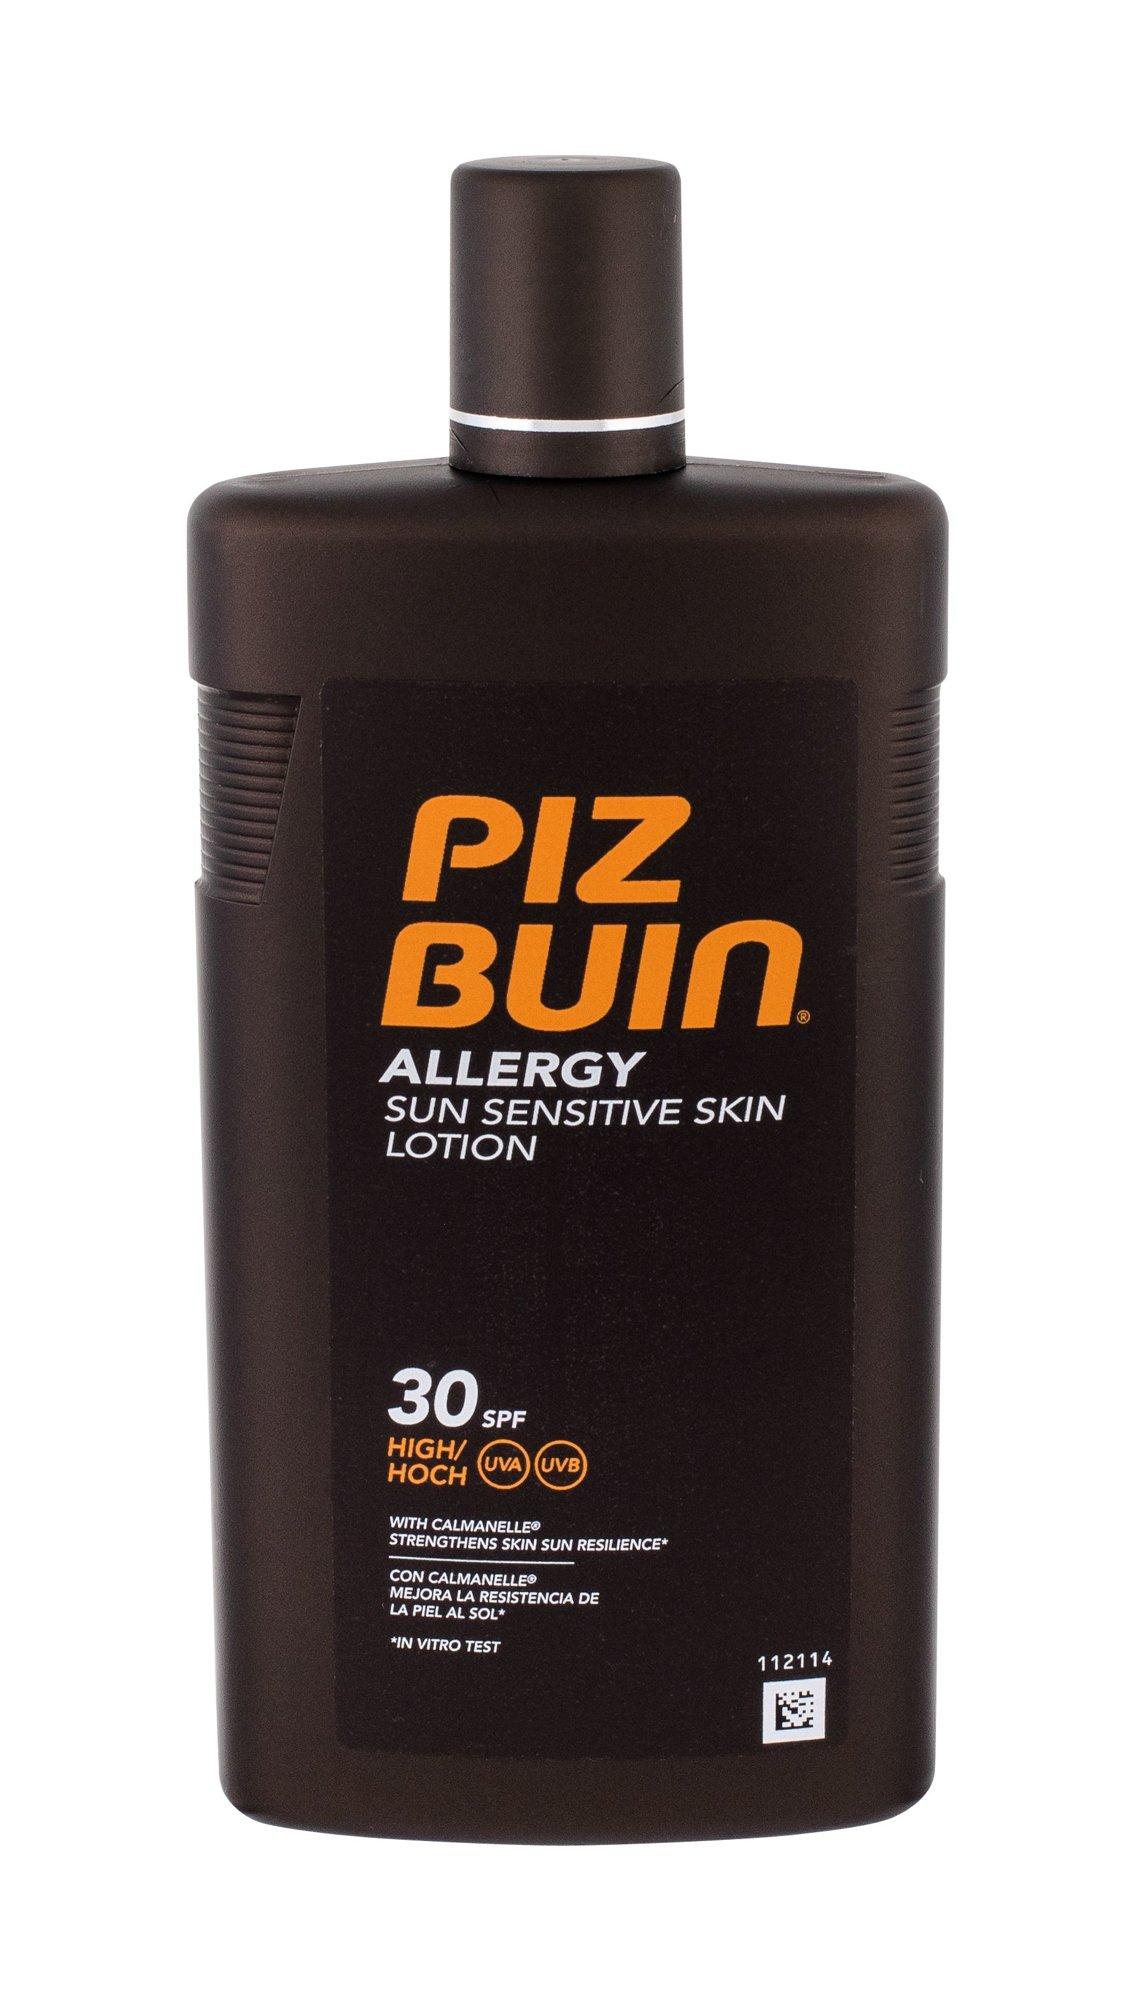 PIZ BUIN Allergy Cosmetic 400ml